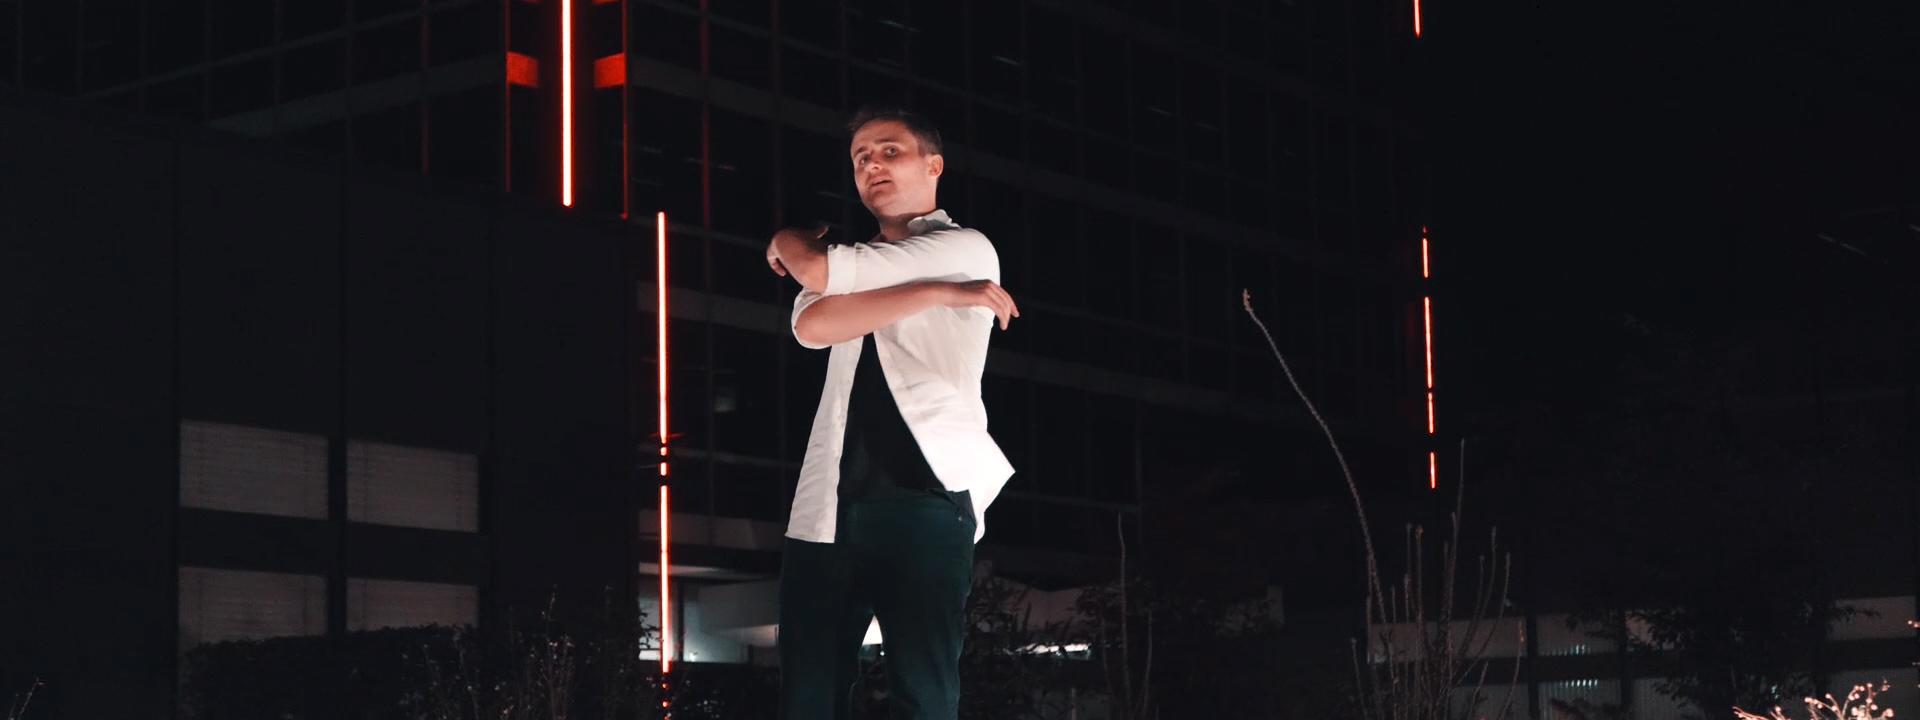 Blazin'Daniel - Nadine (Official Video) 60fps.00_01_45_34.Standbild019